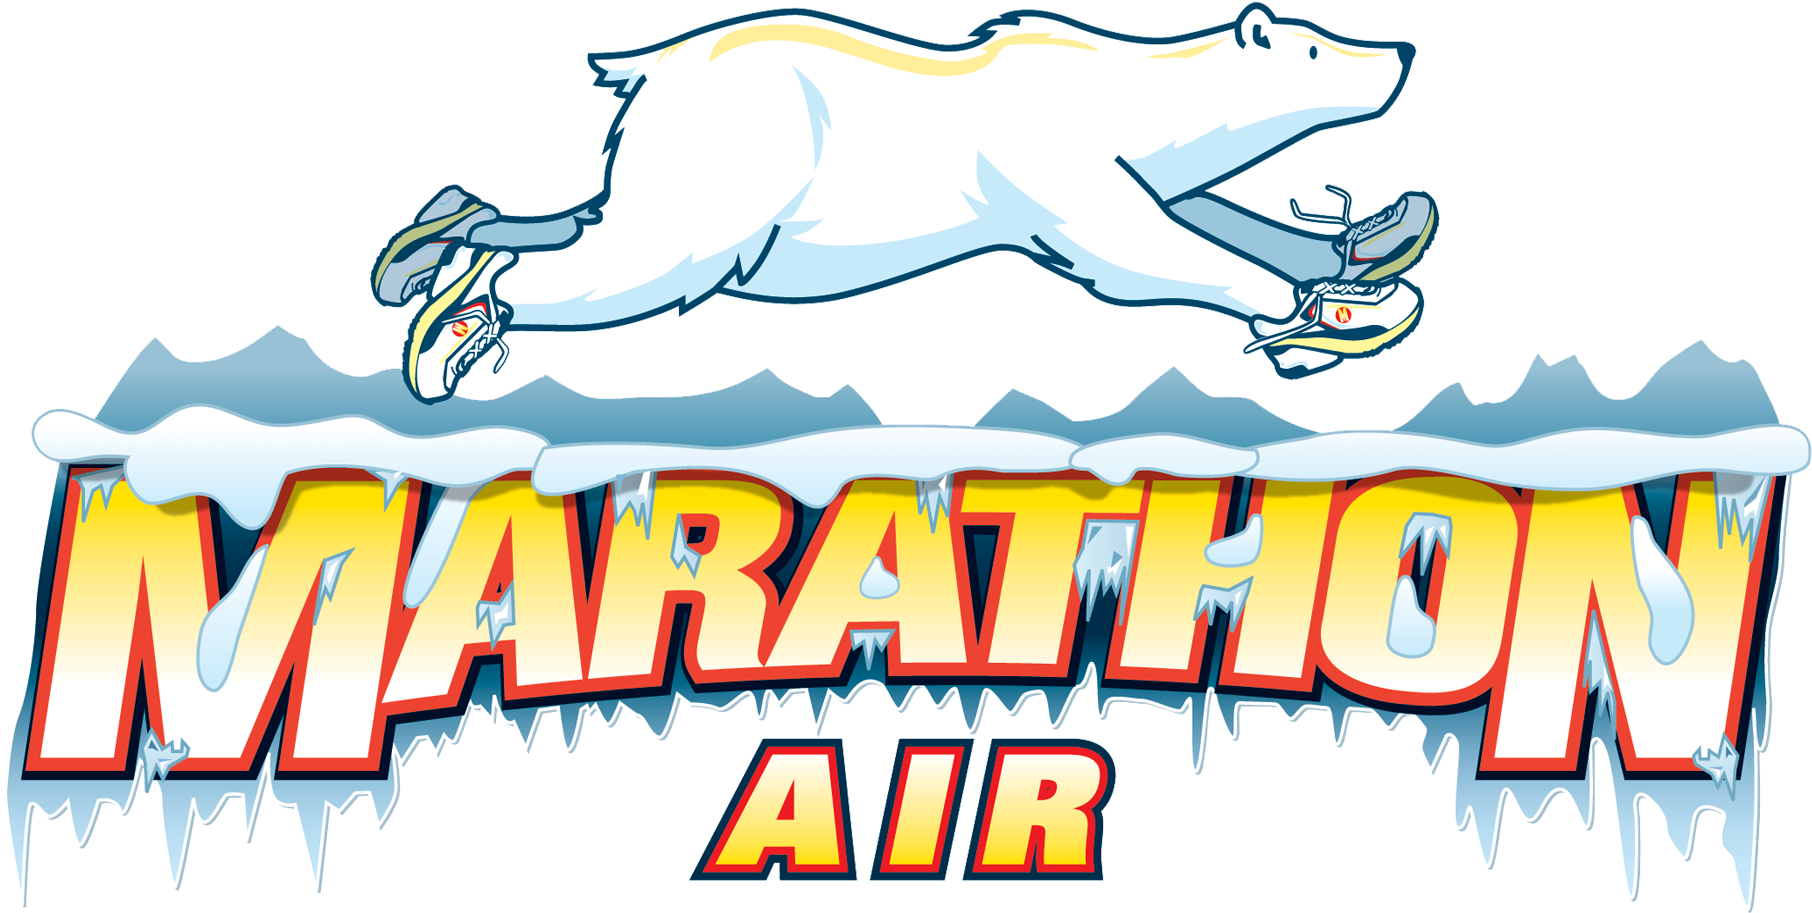 Air Conditioner Service Orlando Fl Clipart.